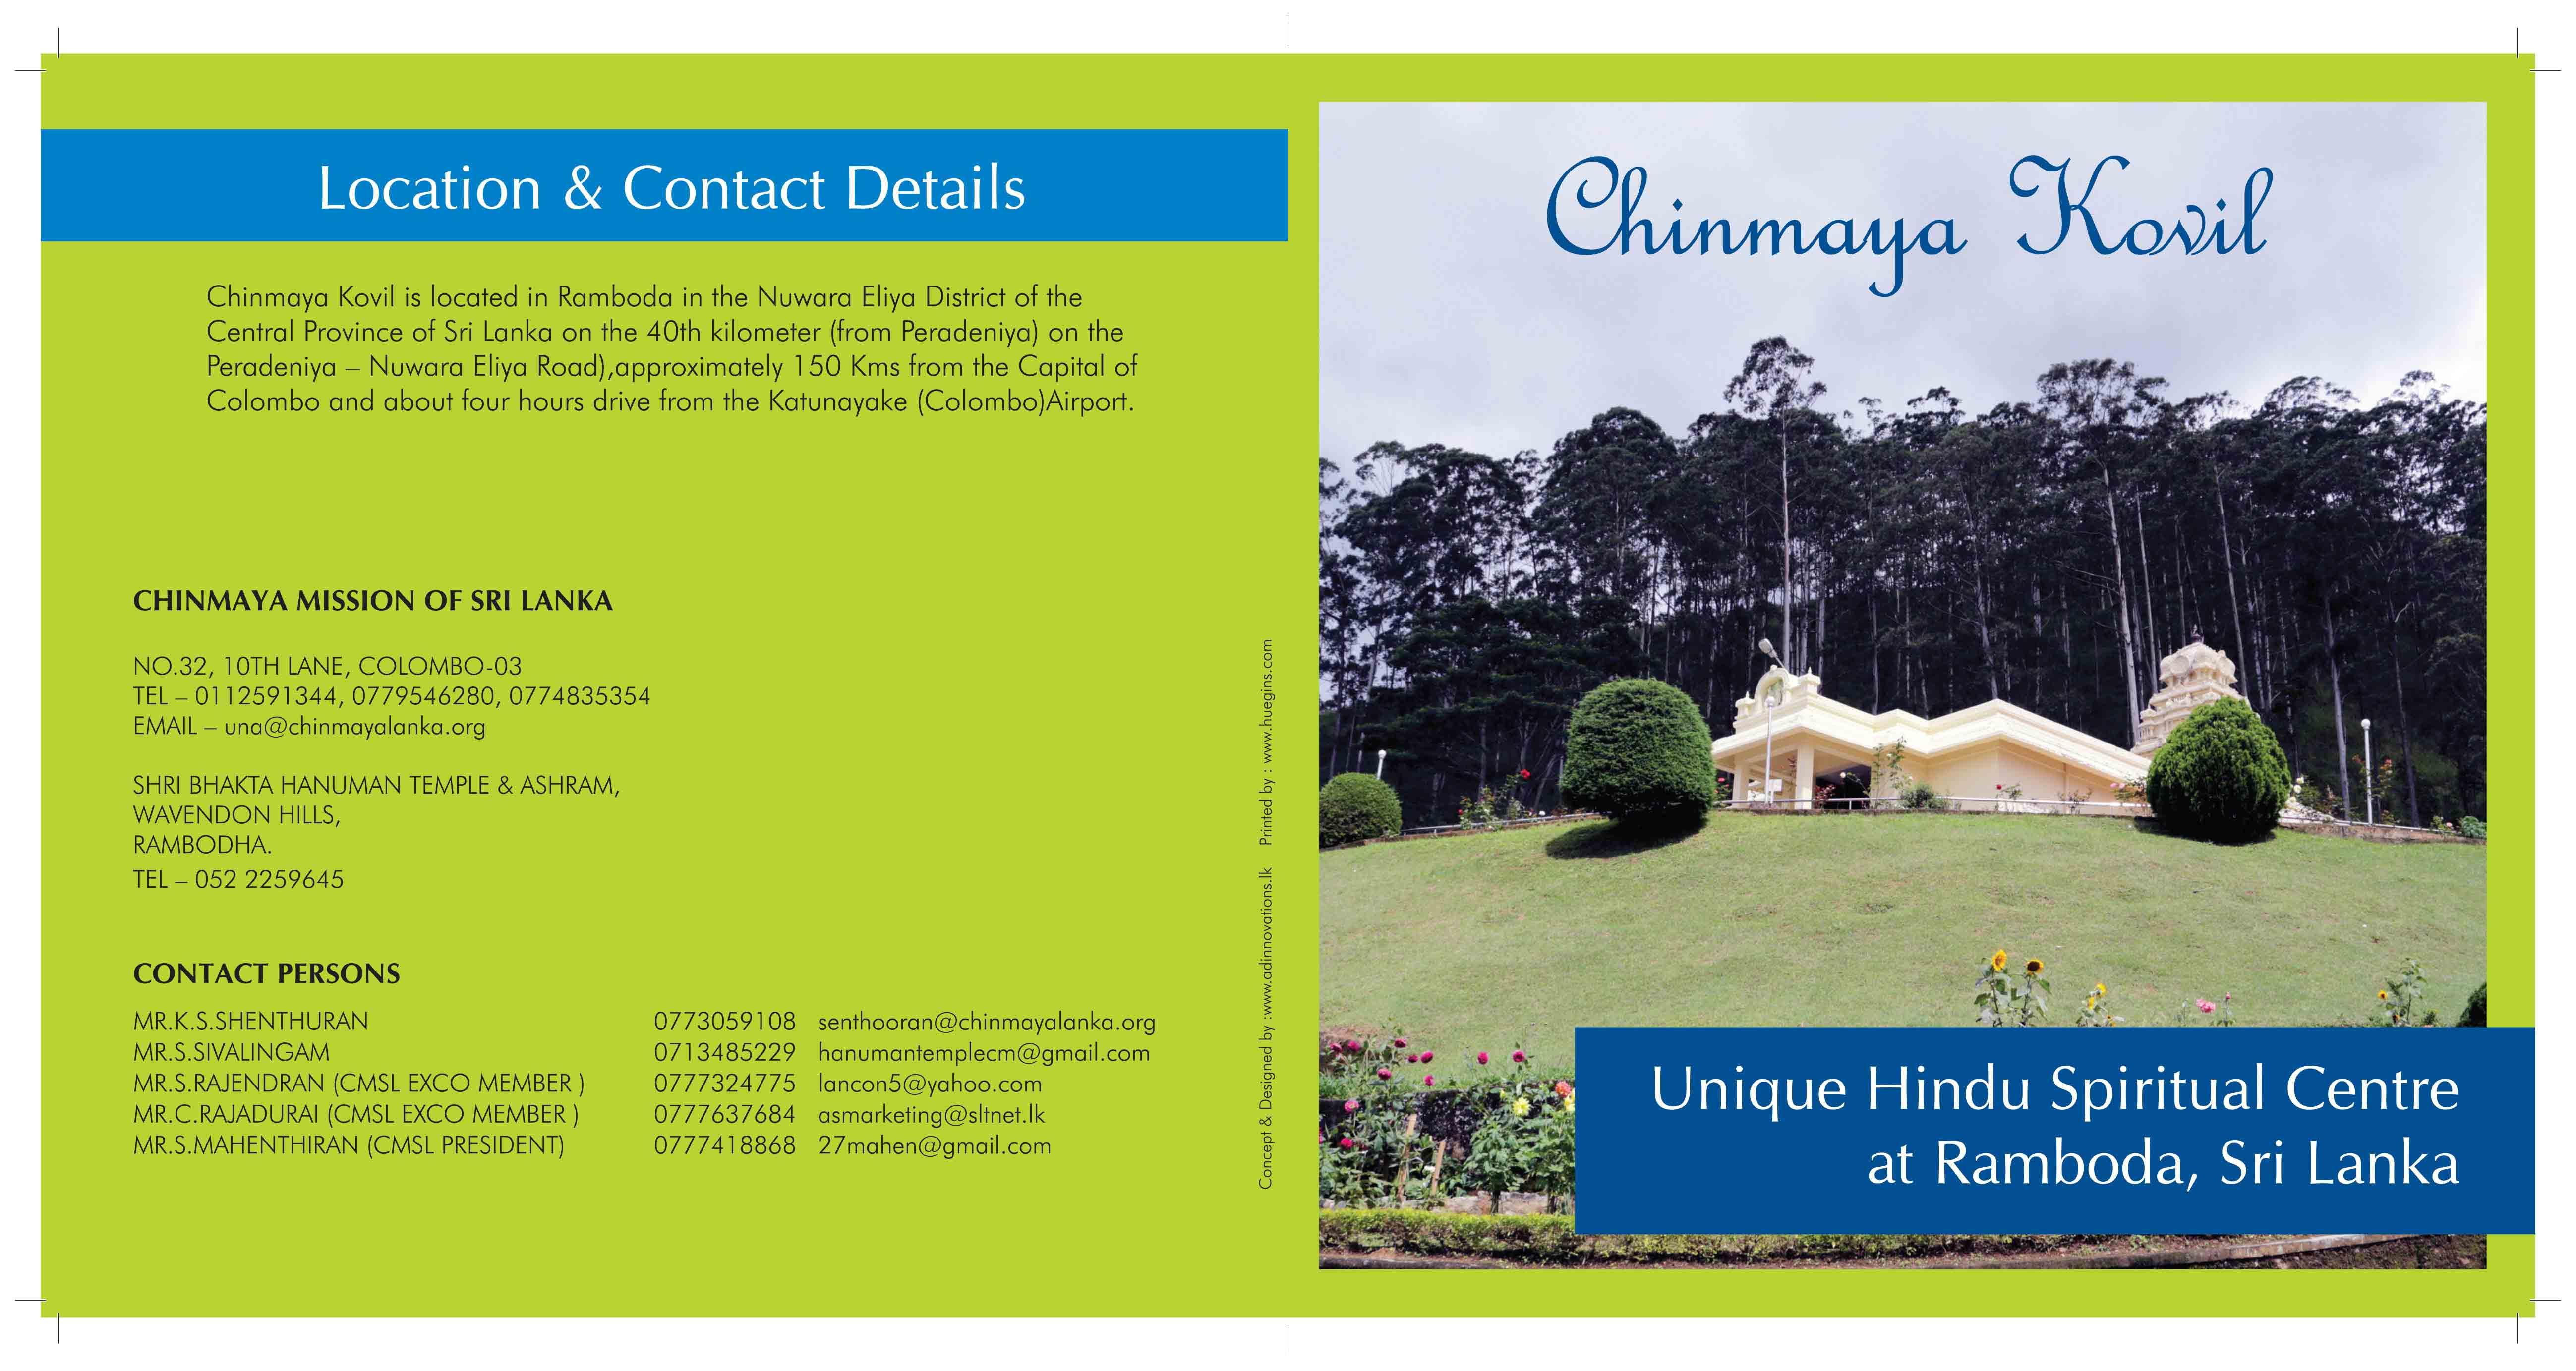 Chinmaya Kovil V2.indd